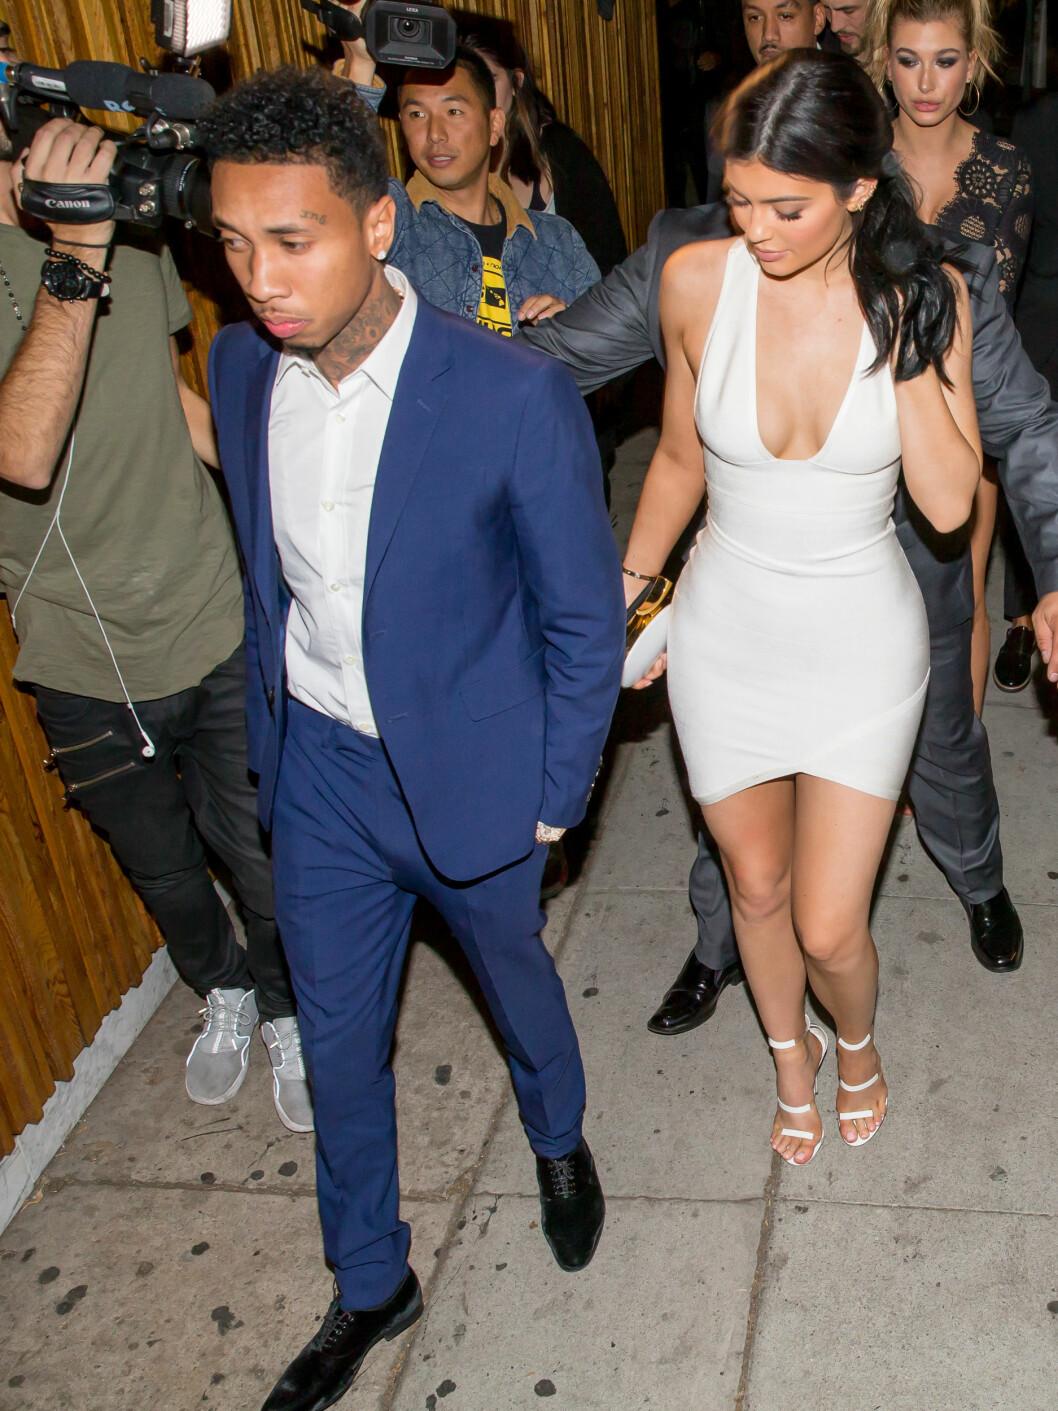 KJENDISVENNER: Kourtney Kardashians halvsøster Kylie Jenner (t.h) og hennes kjæreste Tyga var også til stede på Justin Biebers American Music Awards-fest på Nice Guy i L.A. Foto: Splash News